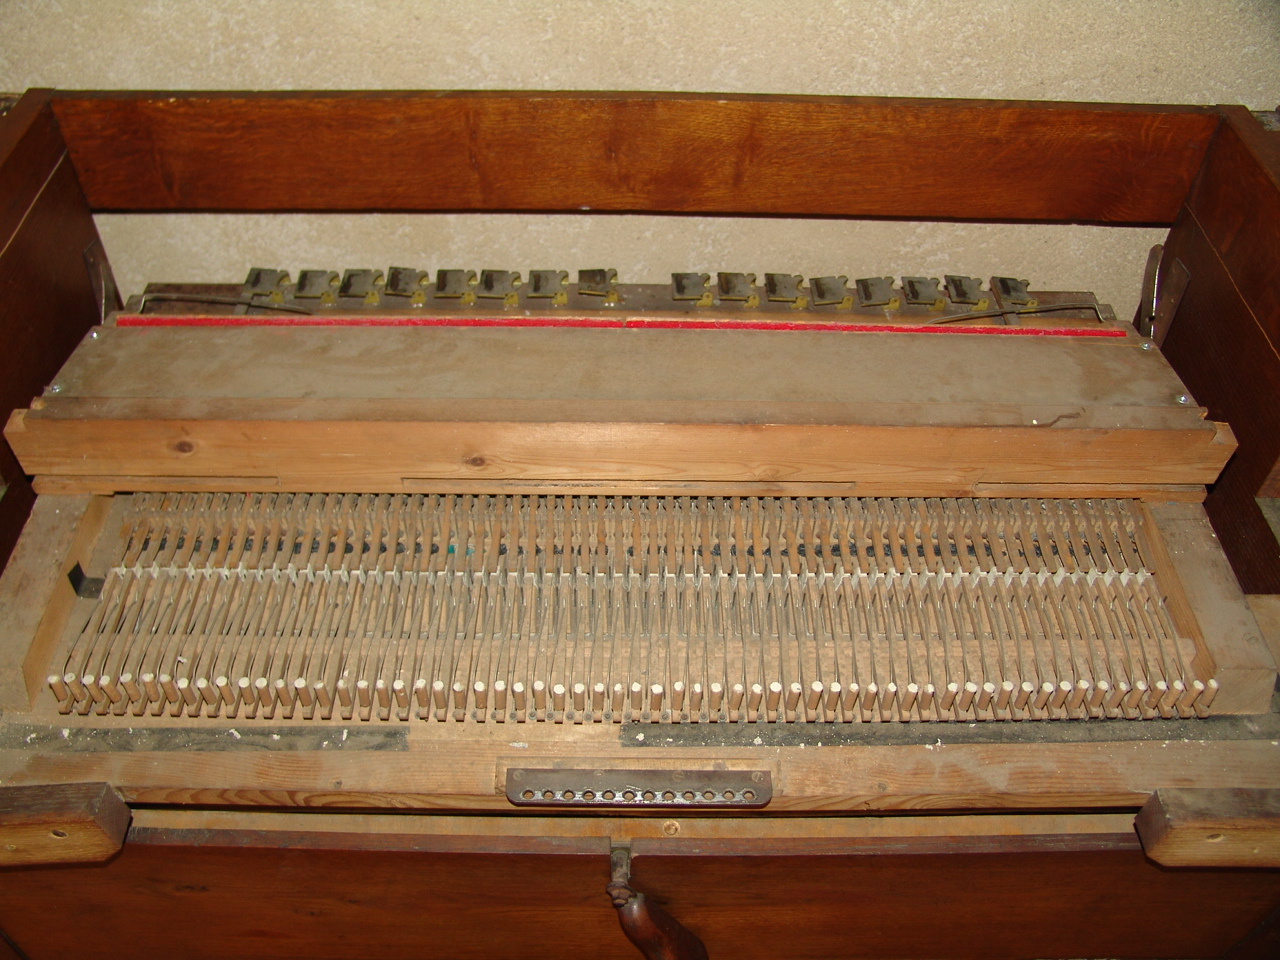 Mon premier harmonium un J-RICHARD 16021908290521182813988405